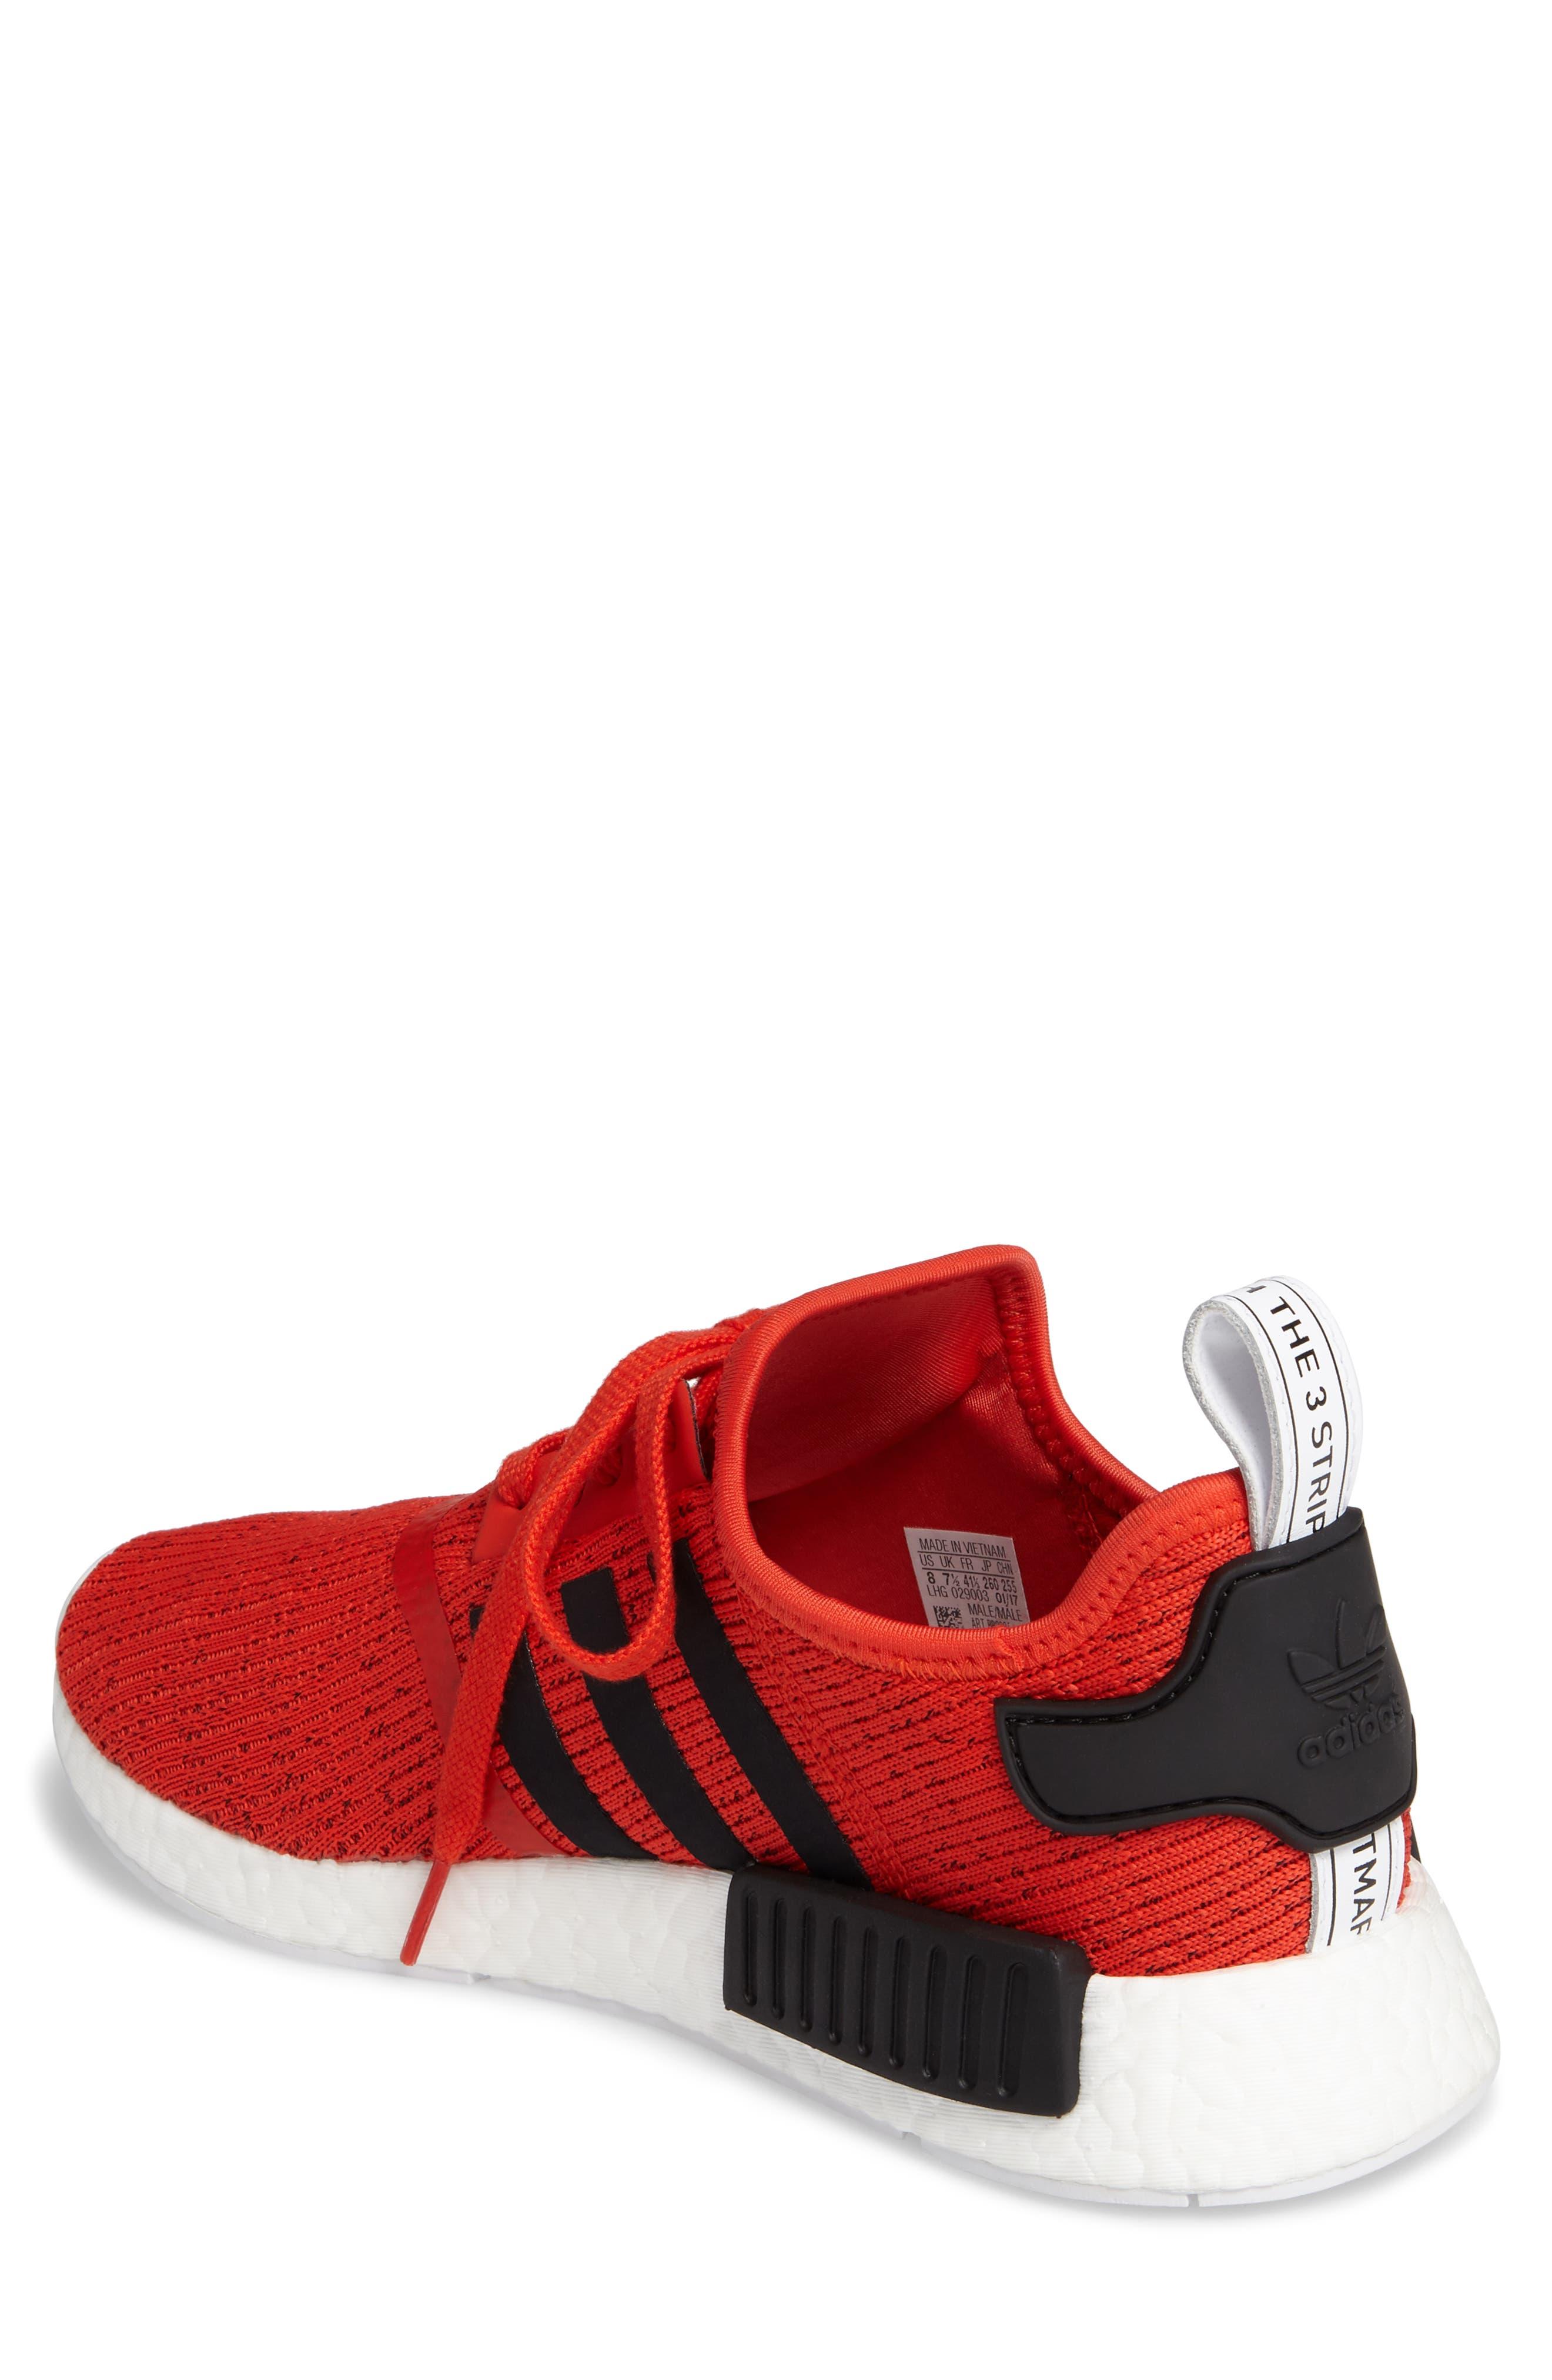 Alternate Image 2  - adidas Originals NMD R1 Sneaker (Men)